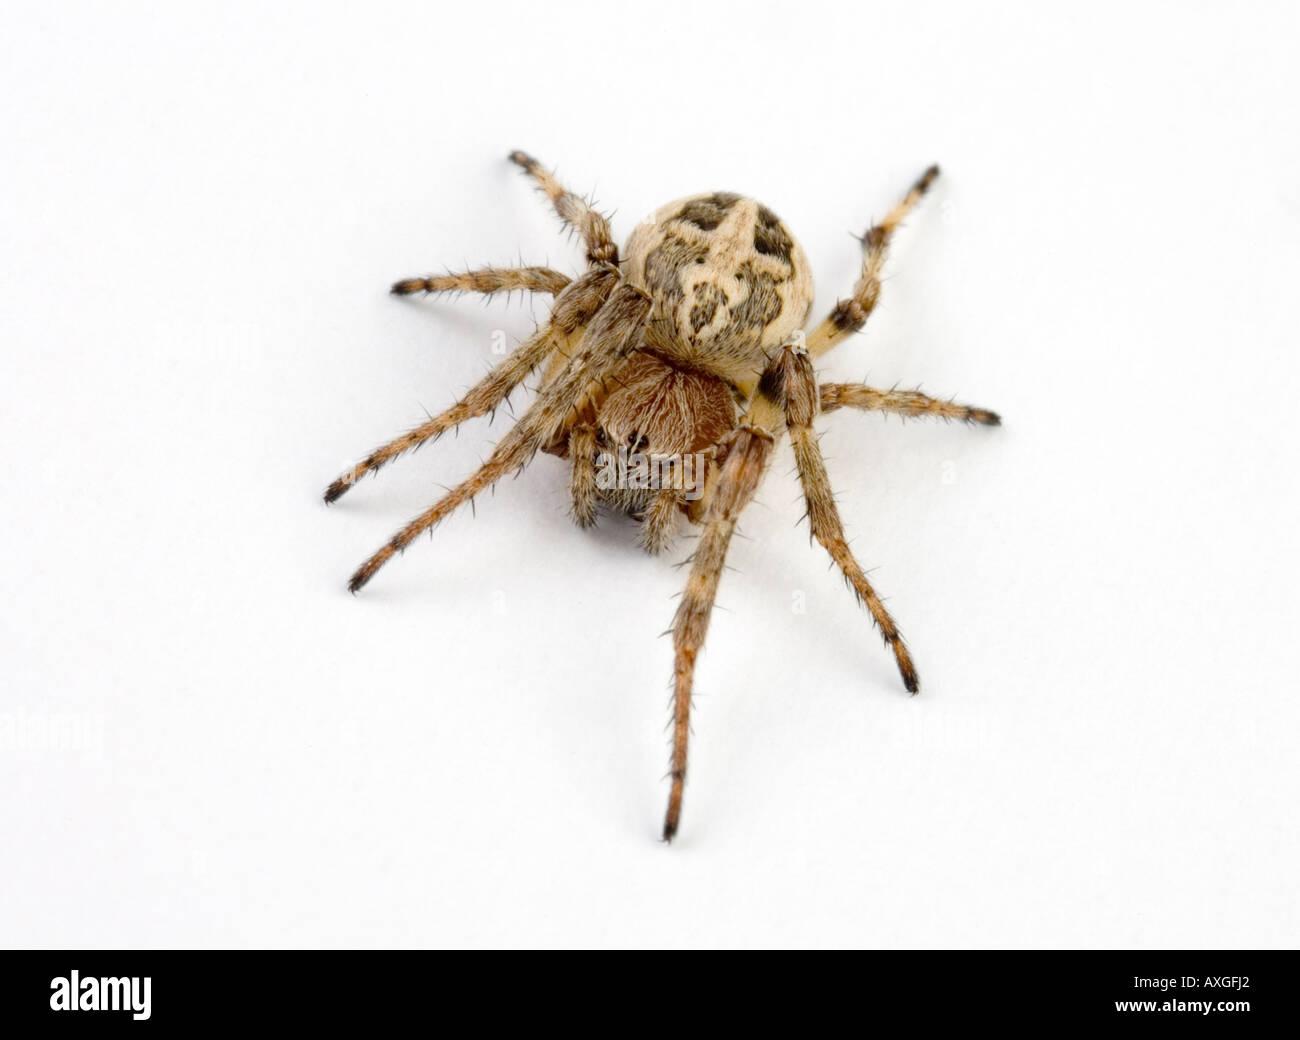 walnut orb-weaver spider - Stock Image